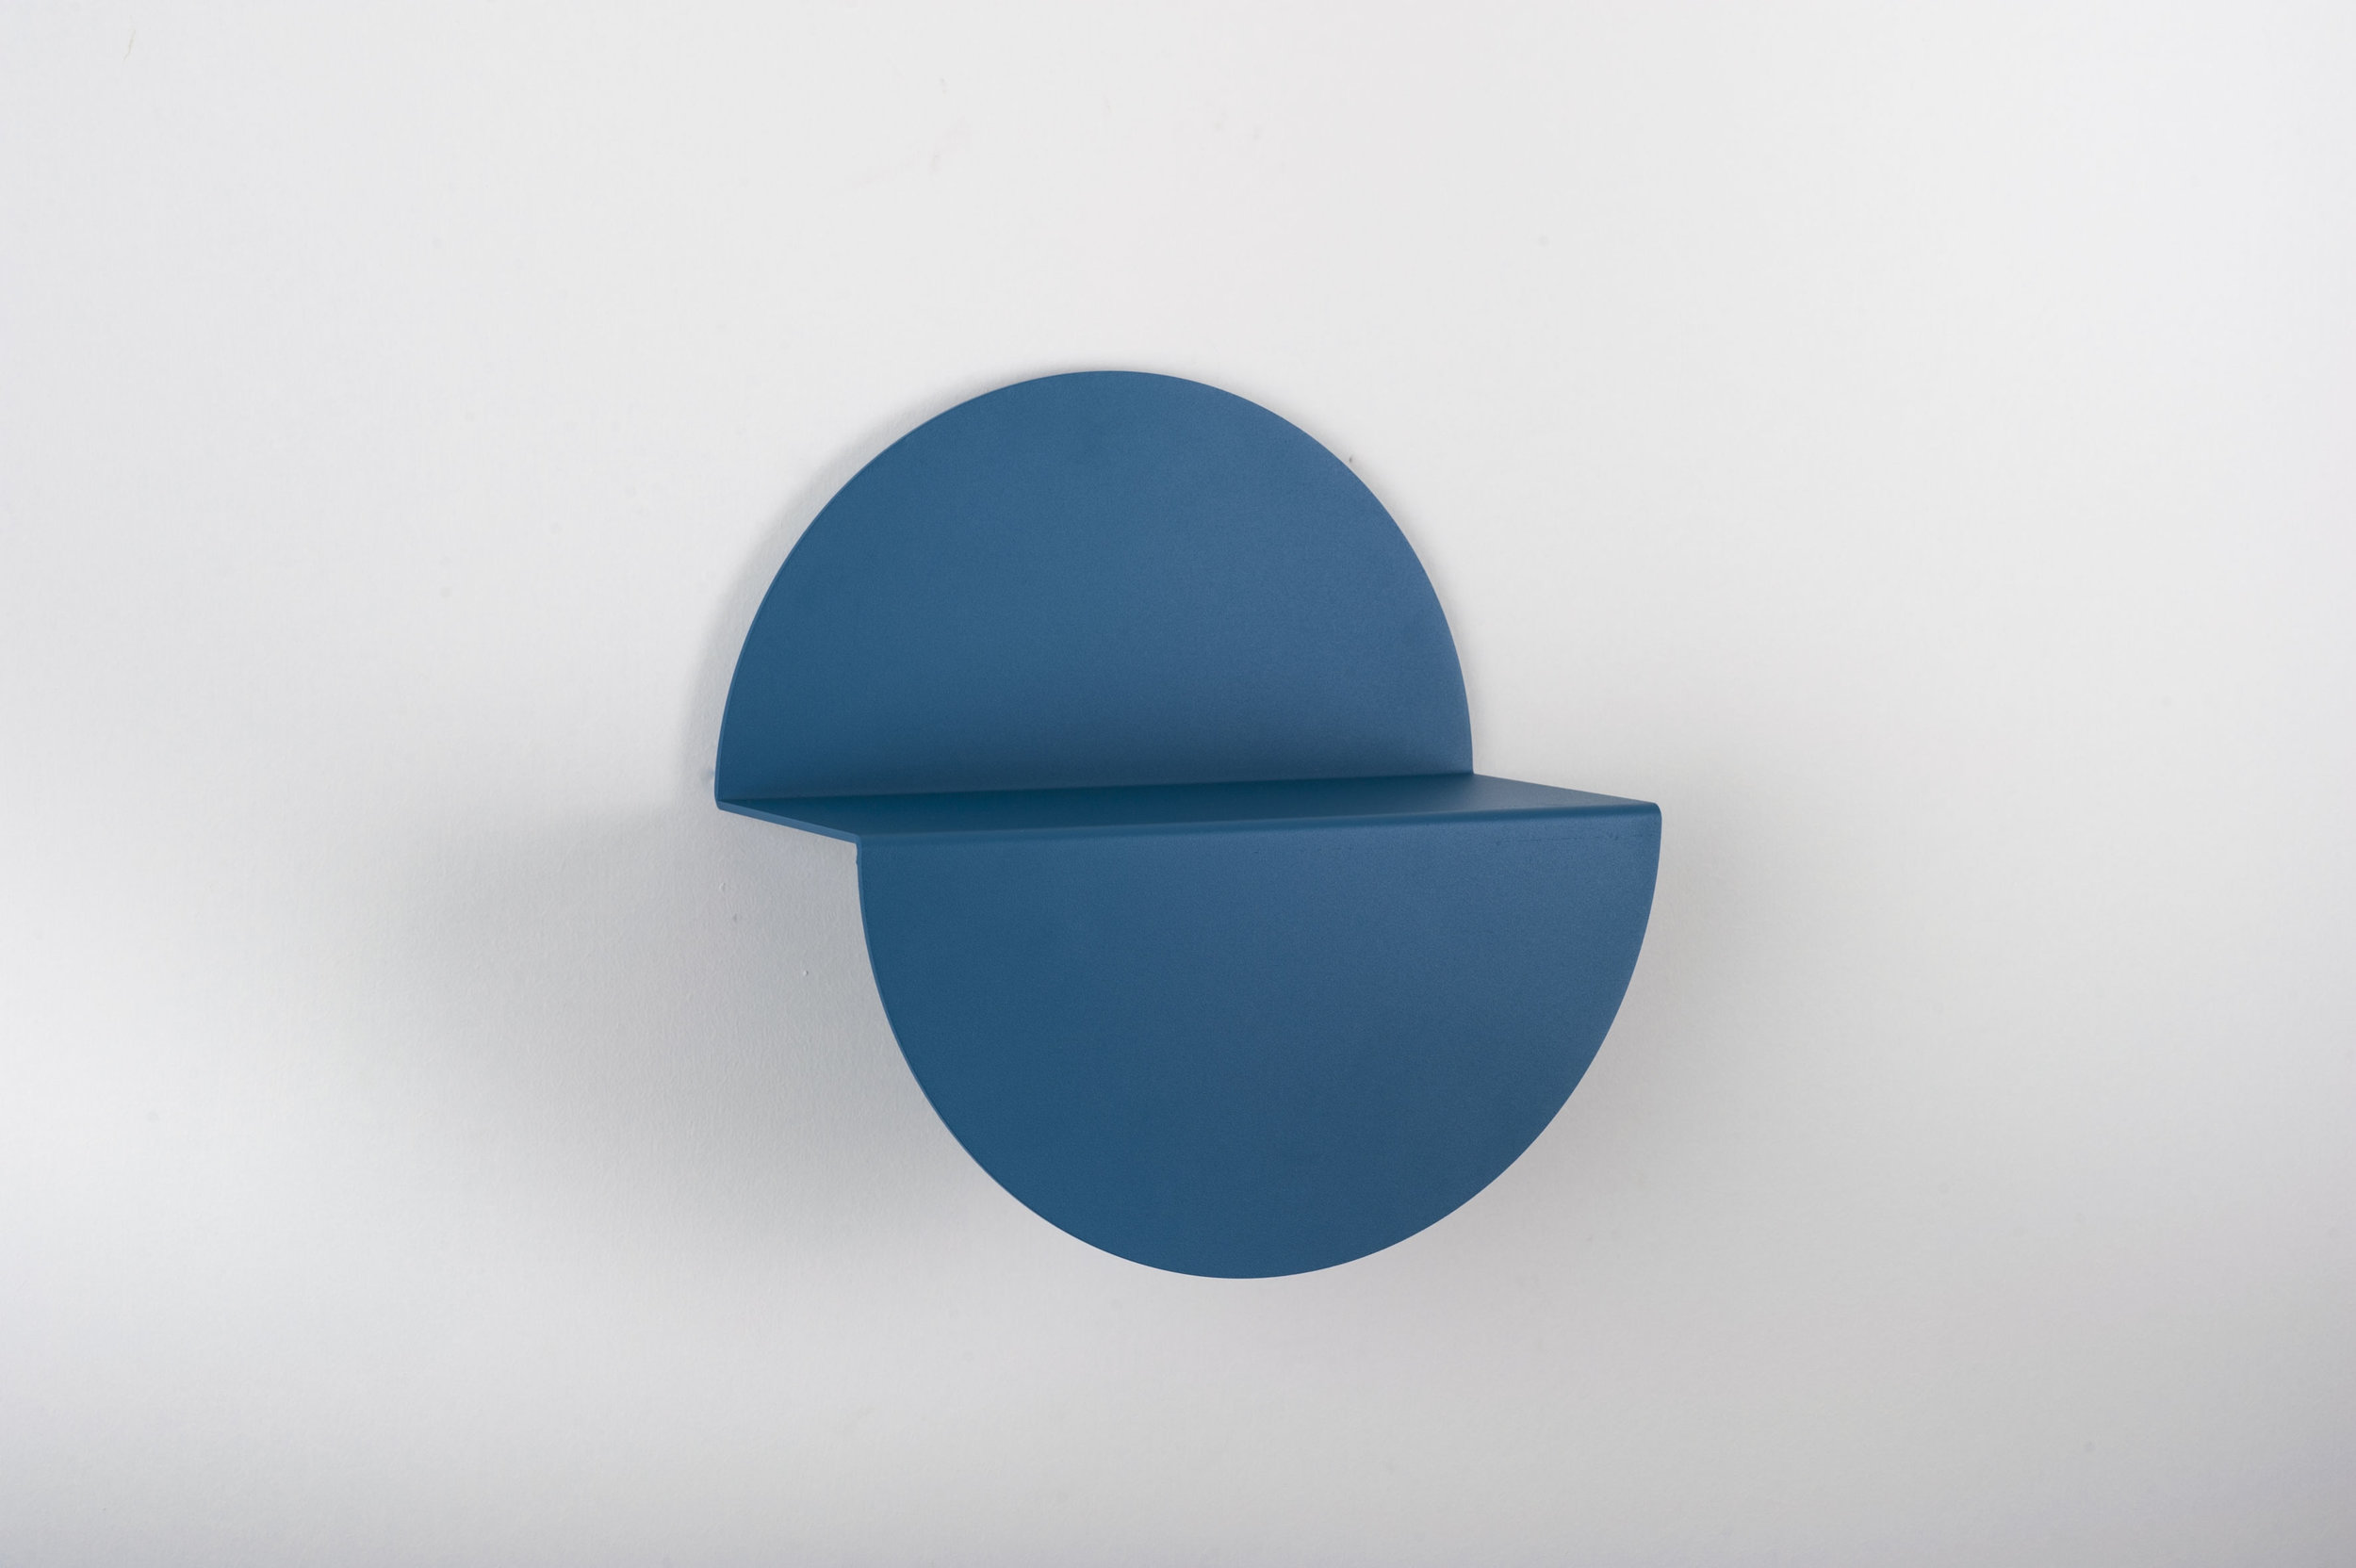 PICCOLA, RAL 5009-BLUE